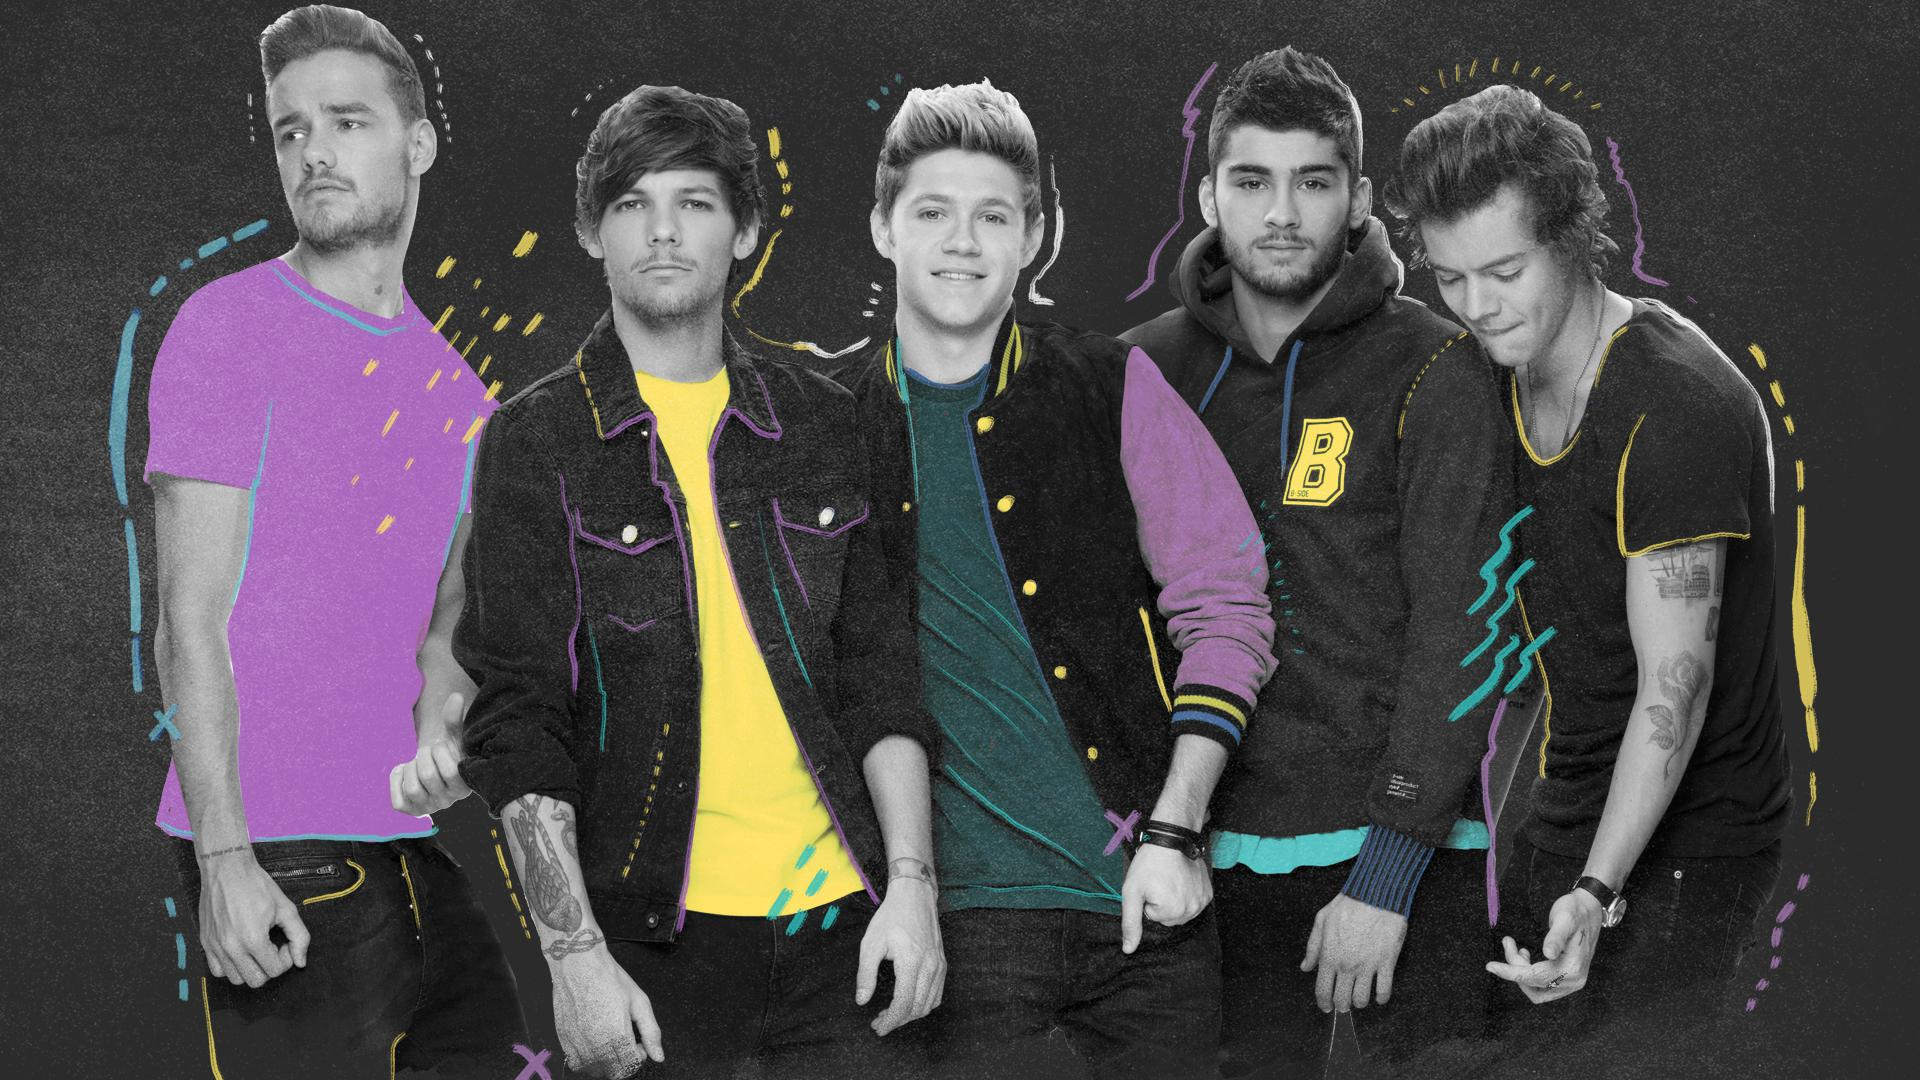 48 One Direction Wallpaper For Desktop 2015 On Wallpapersafari